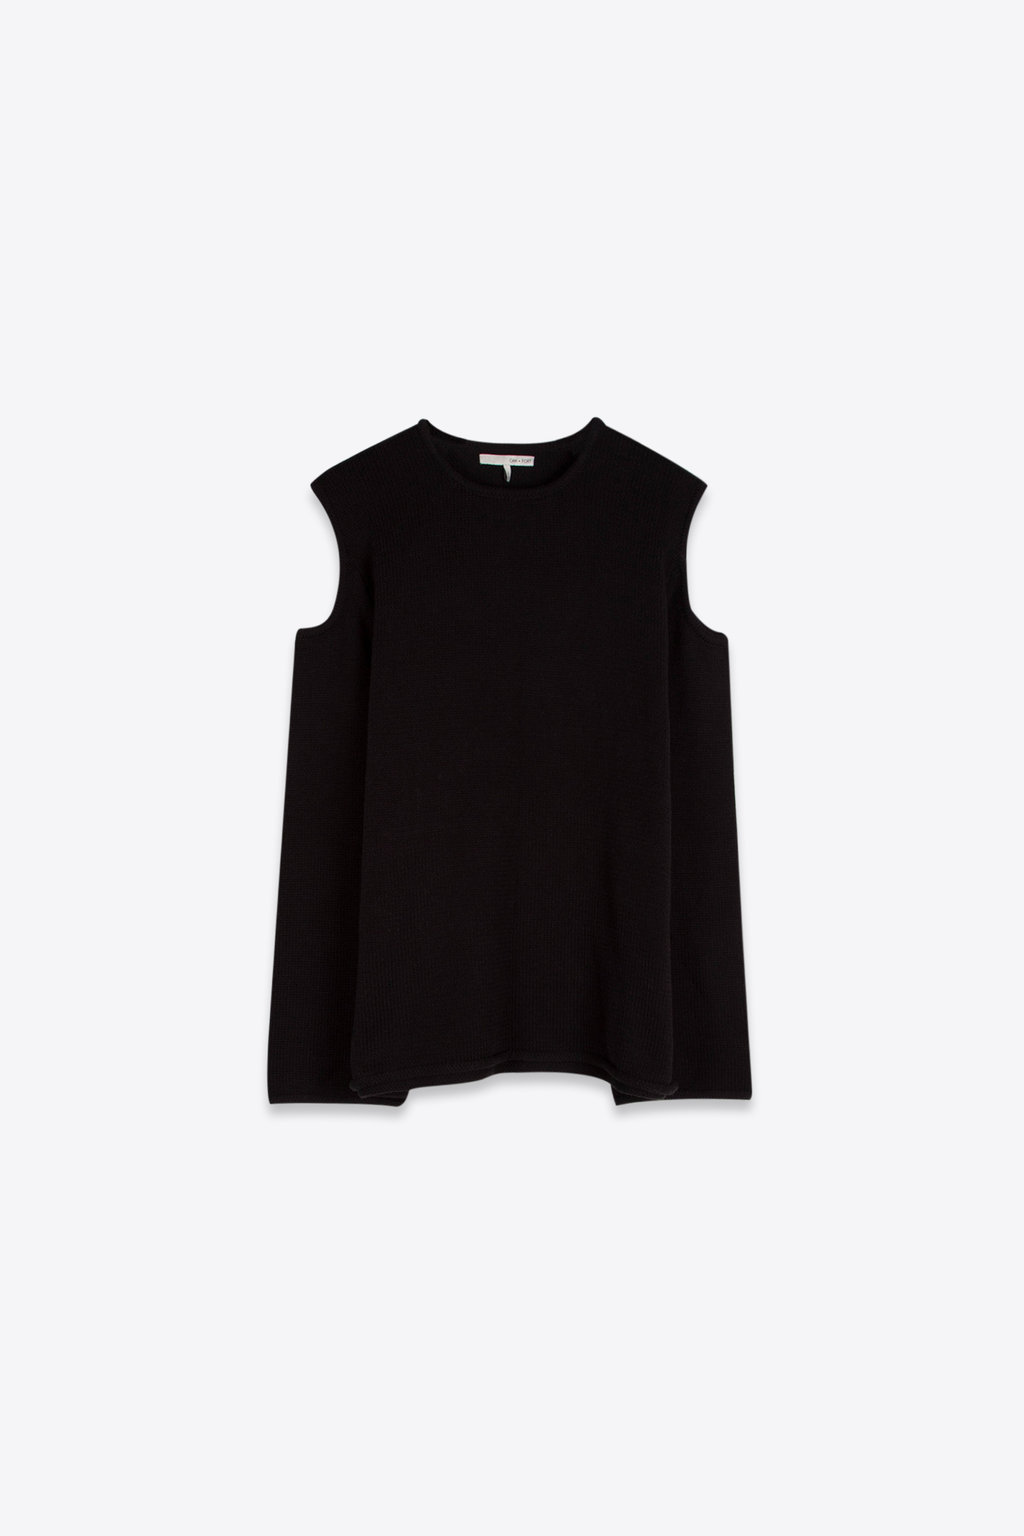 Sweater 1097 Black 7